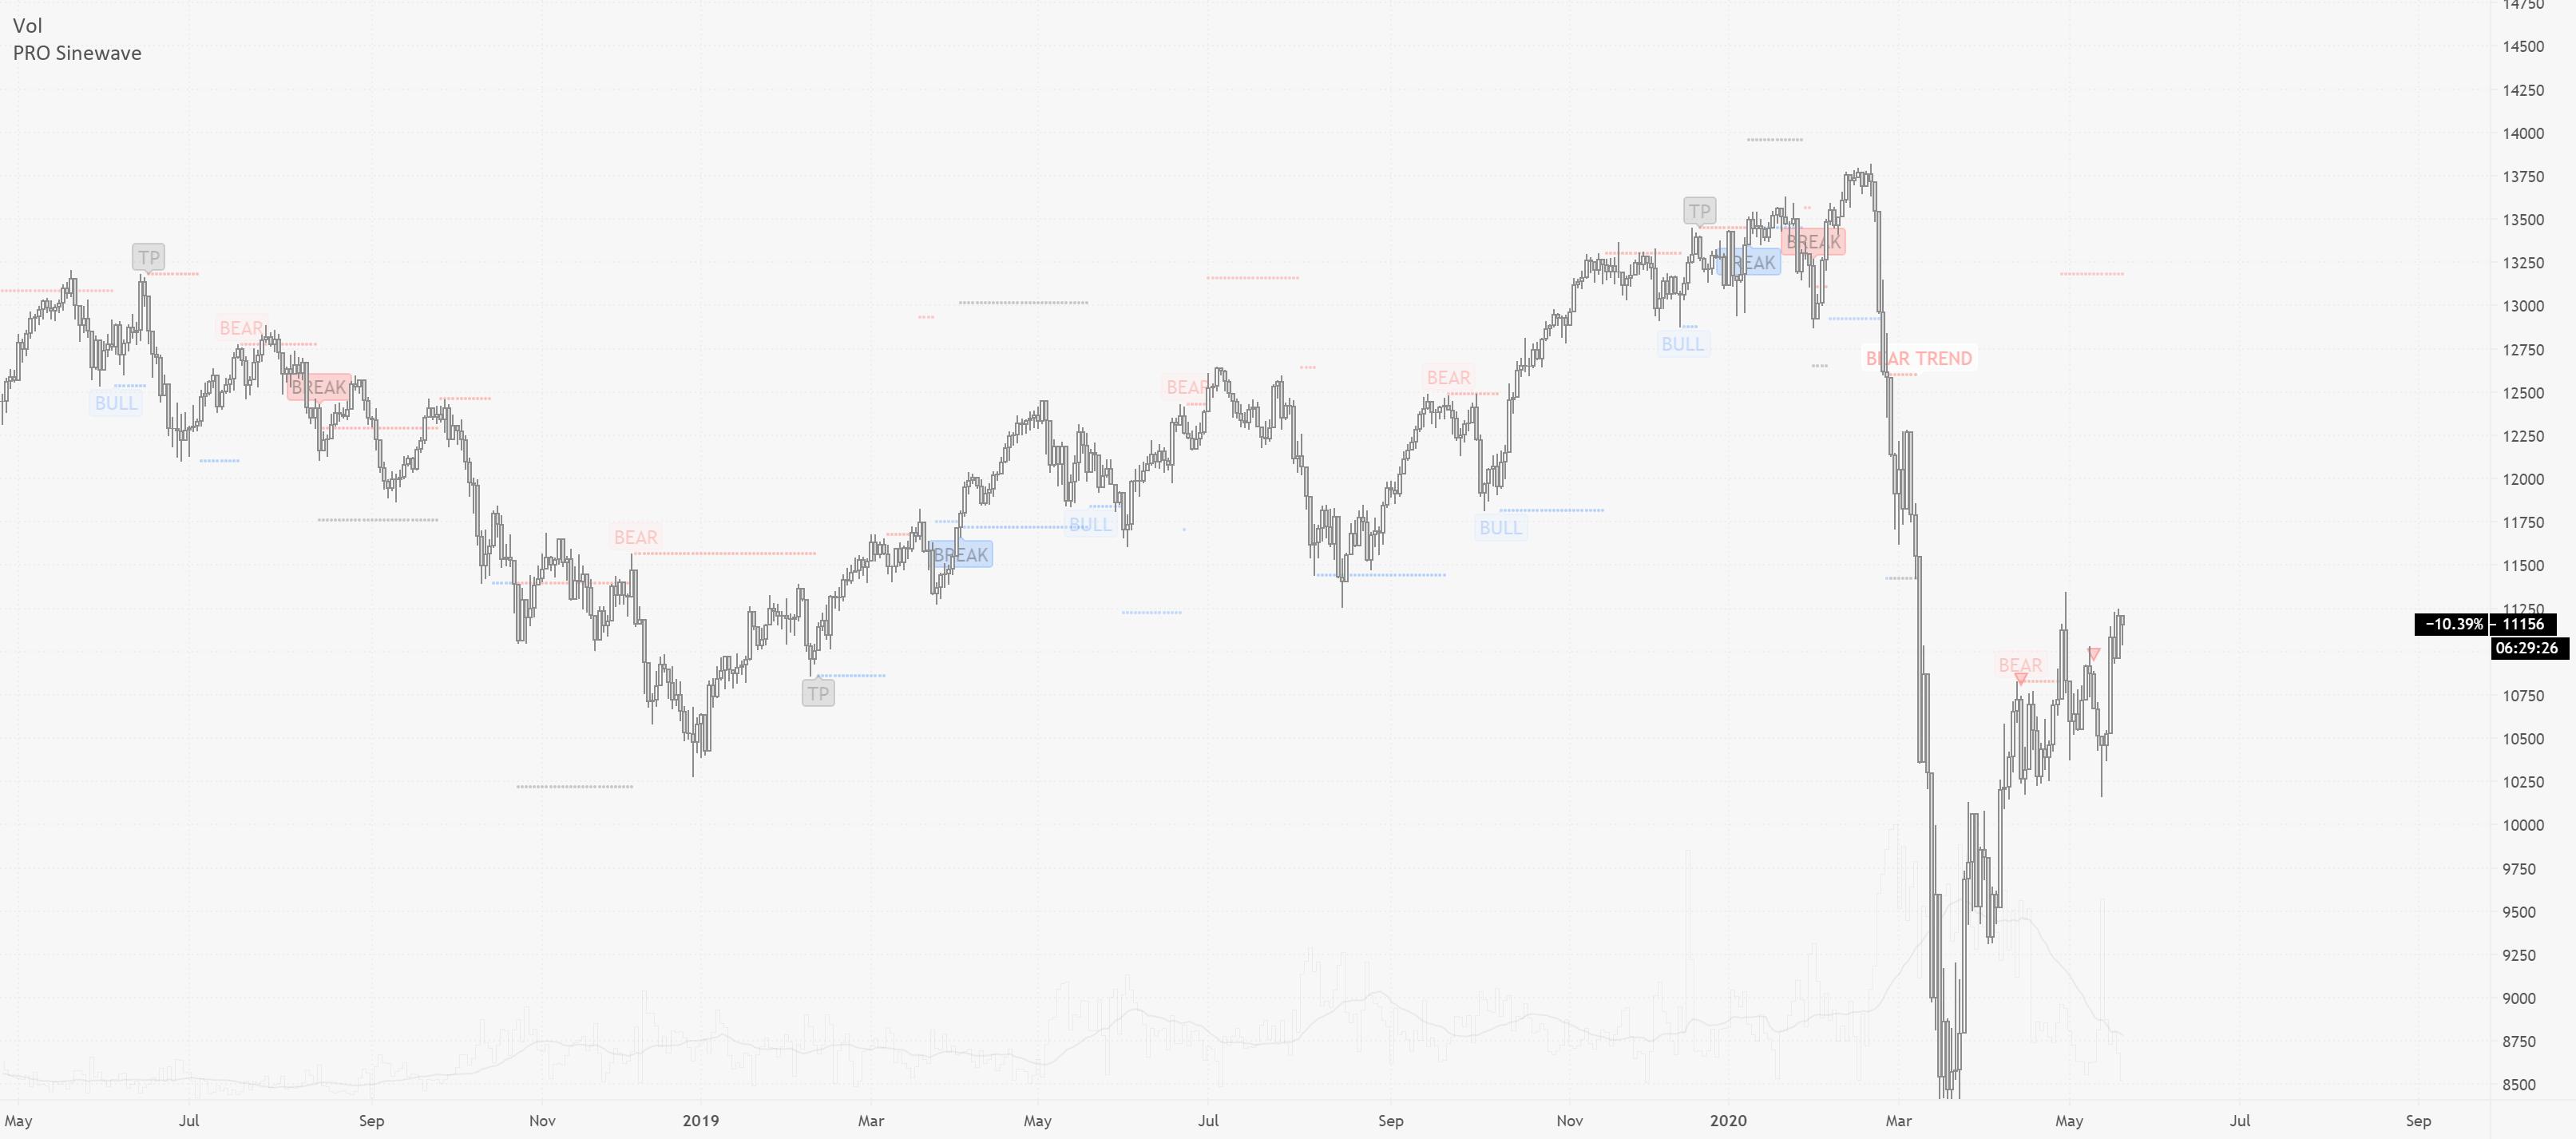 PRO Sinewave — Indicator by PRO_Indicators — TradingView